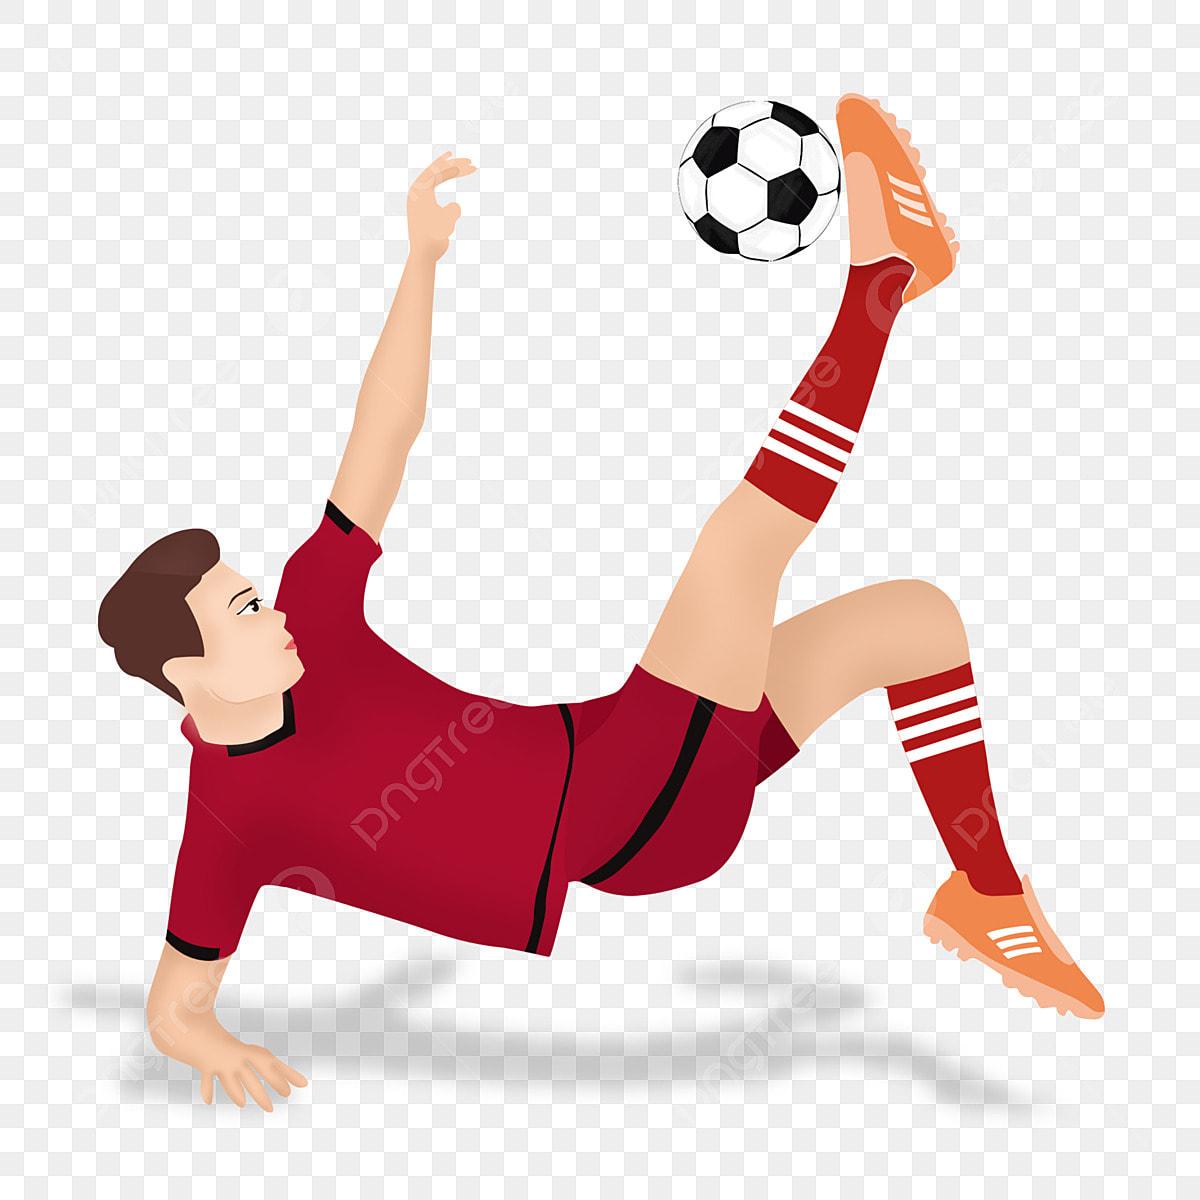 Bahan Pemain Bola Sepak Kreatif Kartun Pemain Bola Sepak